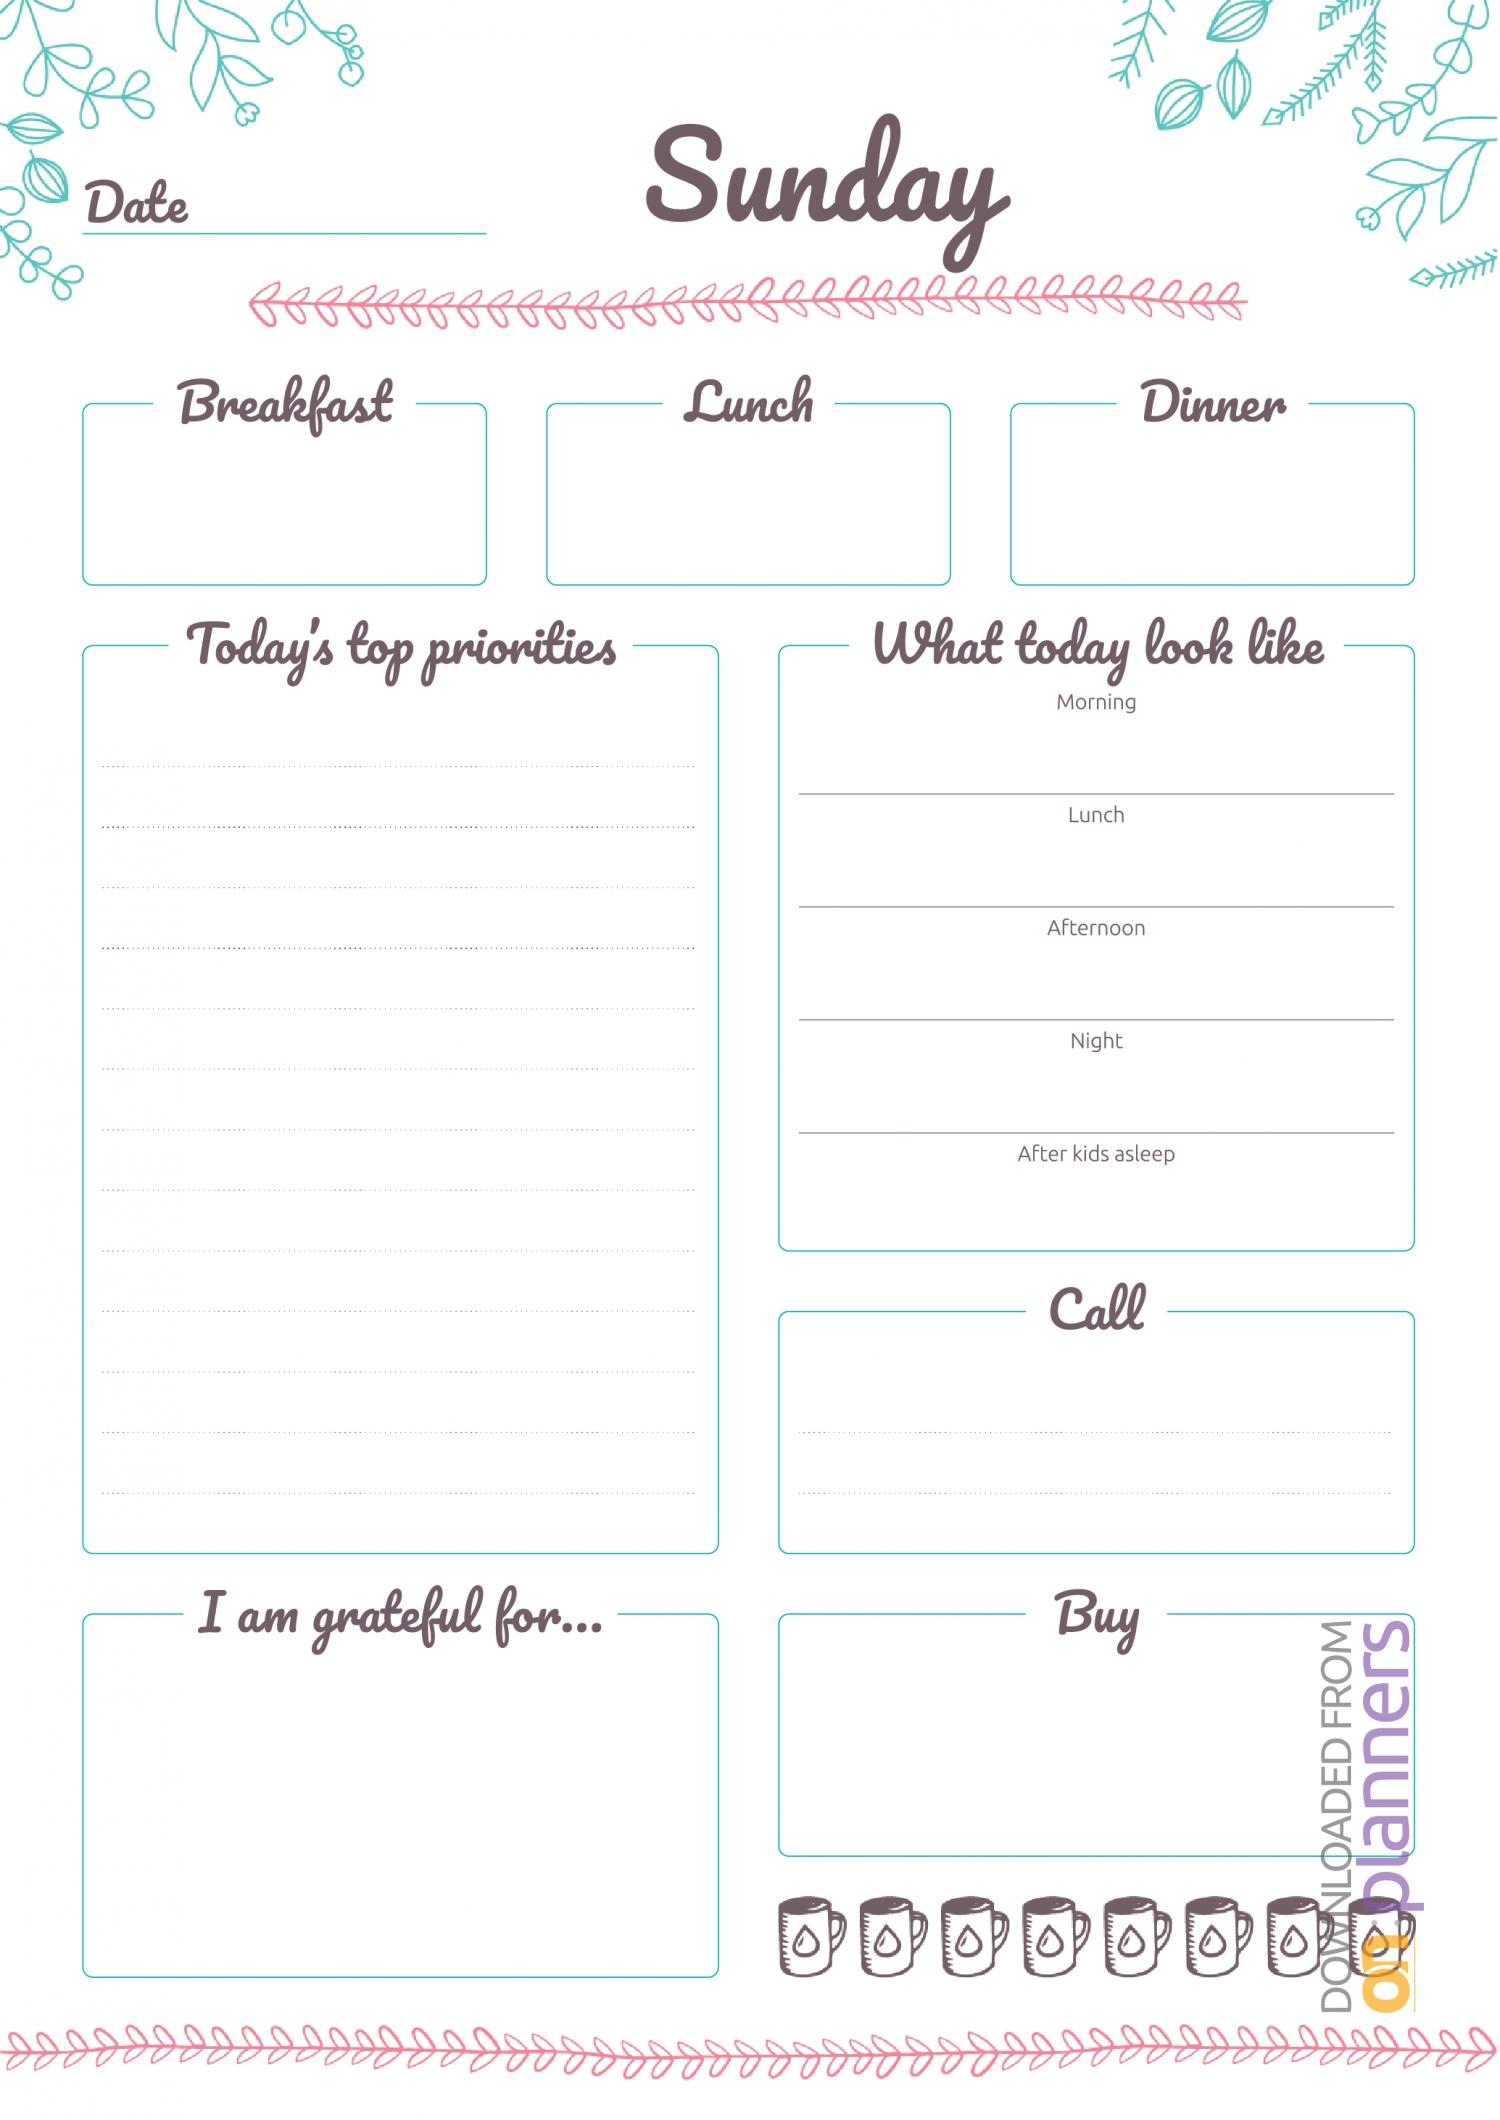 Free Printable 7 Days Weekly Planner Pdf Download  7 Day Weekly Planner Pdf